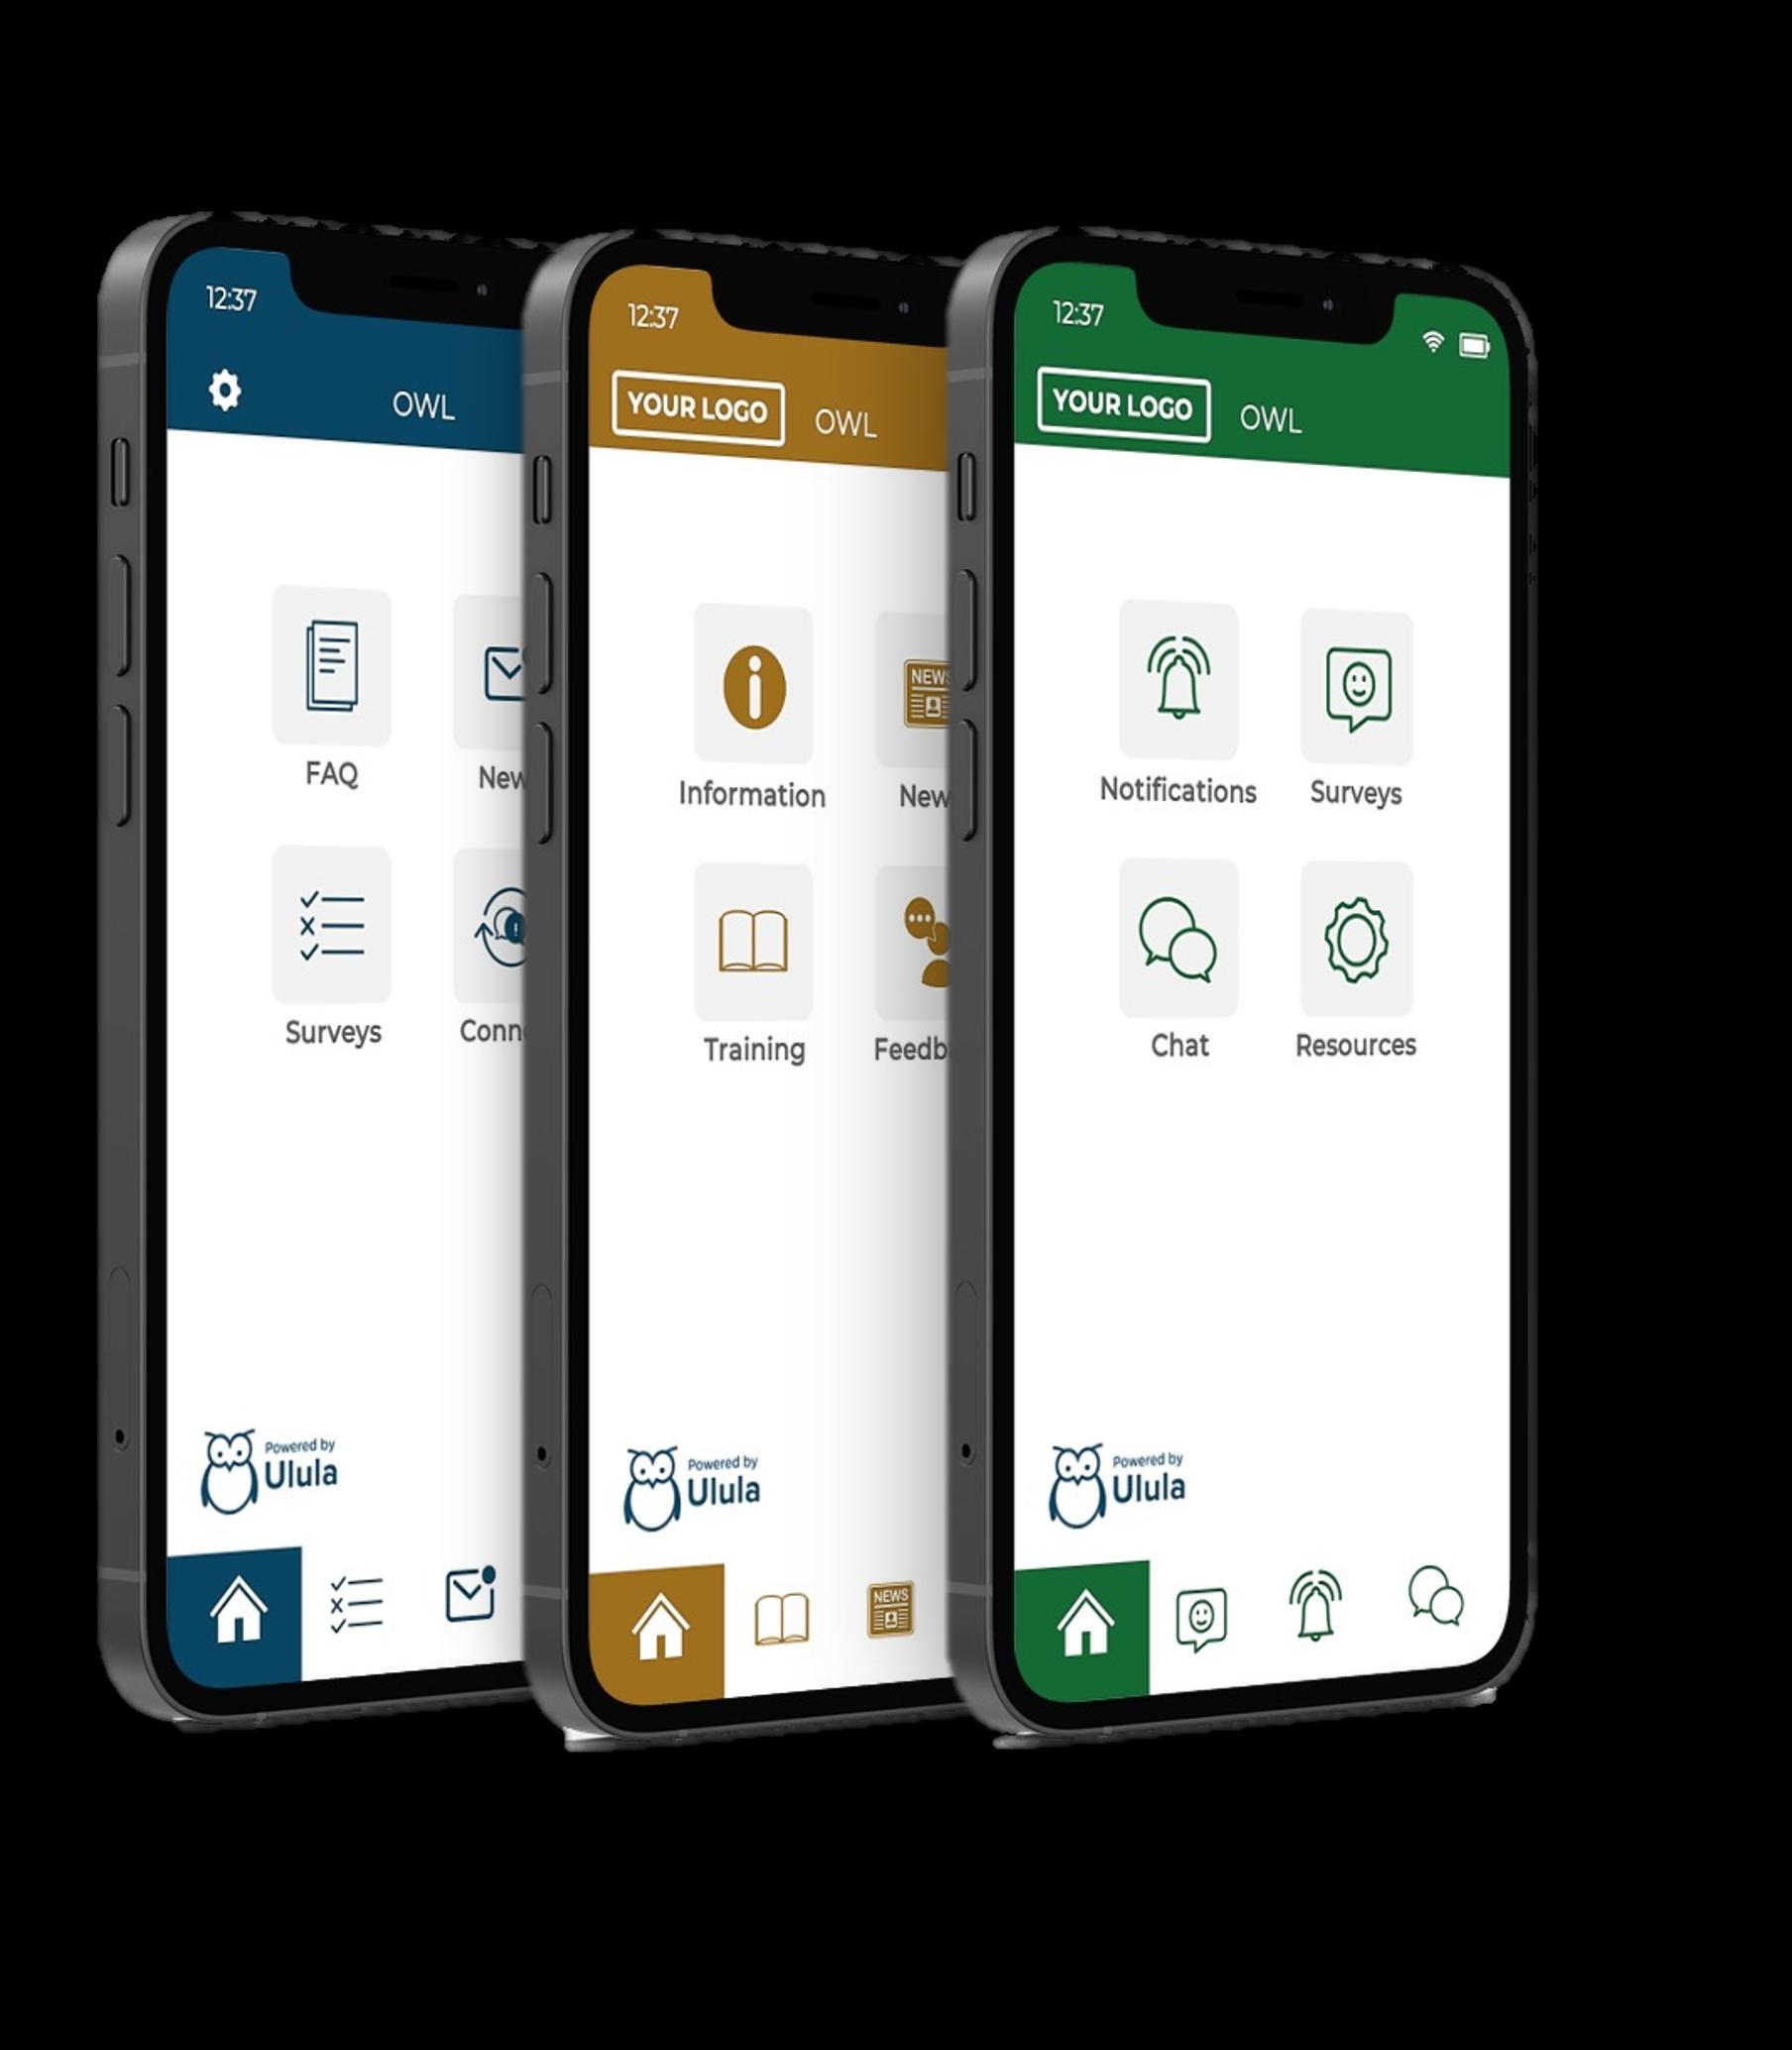 Ulula's OWL app depicted in different branding